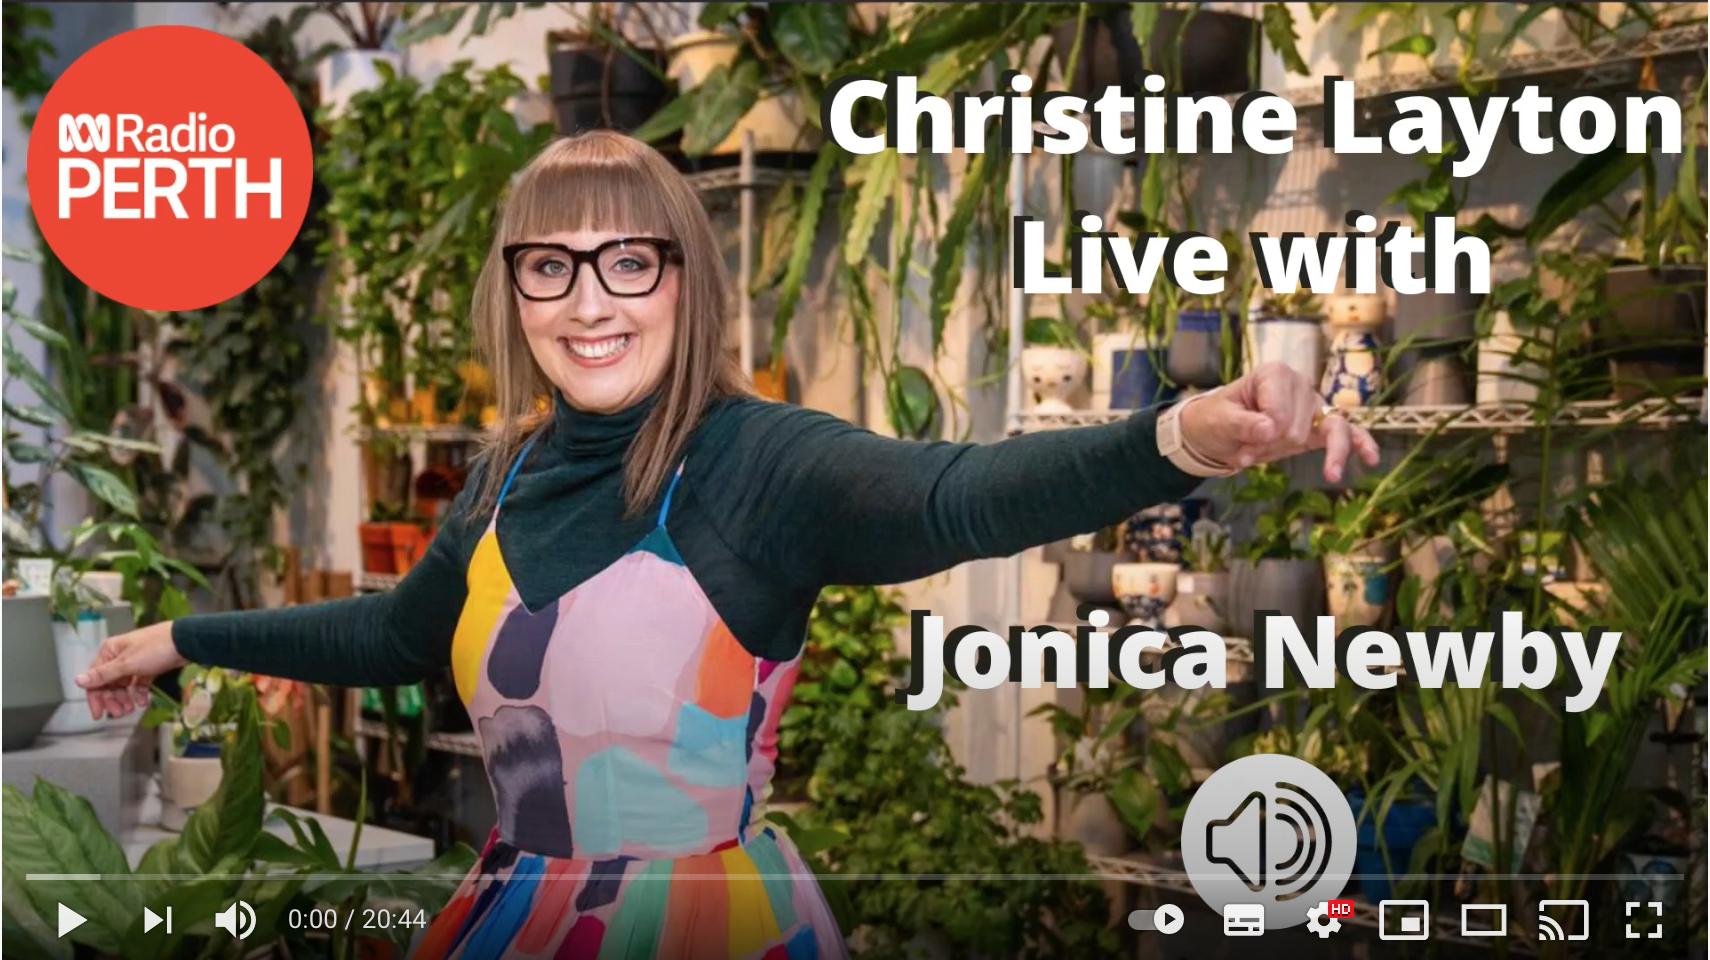 Christine Layton Live with Jonica Newby